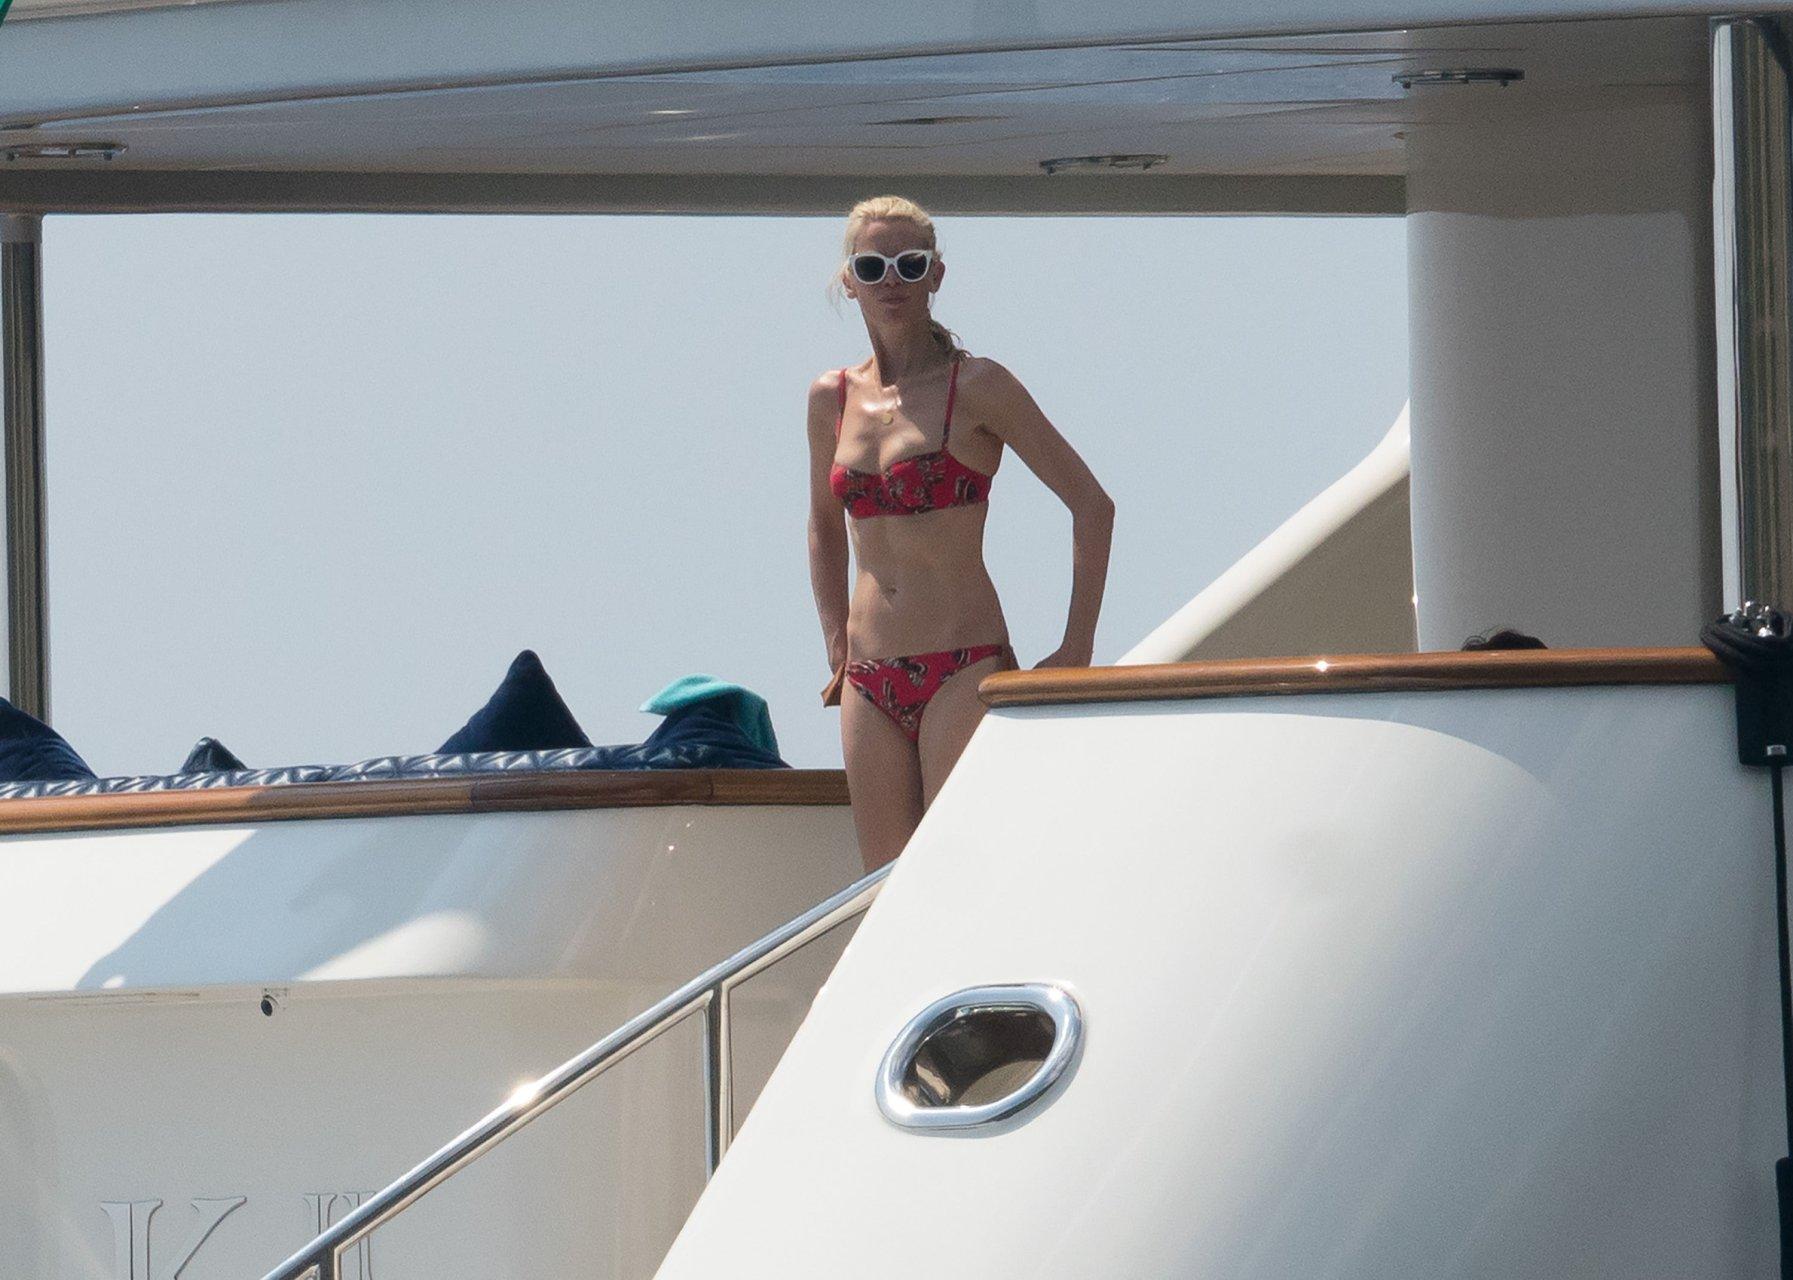 Porno Dascha Polanco  nudes (76 photos), iCloud, underwear